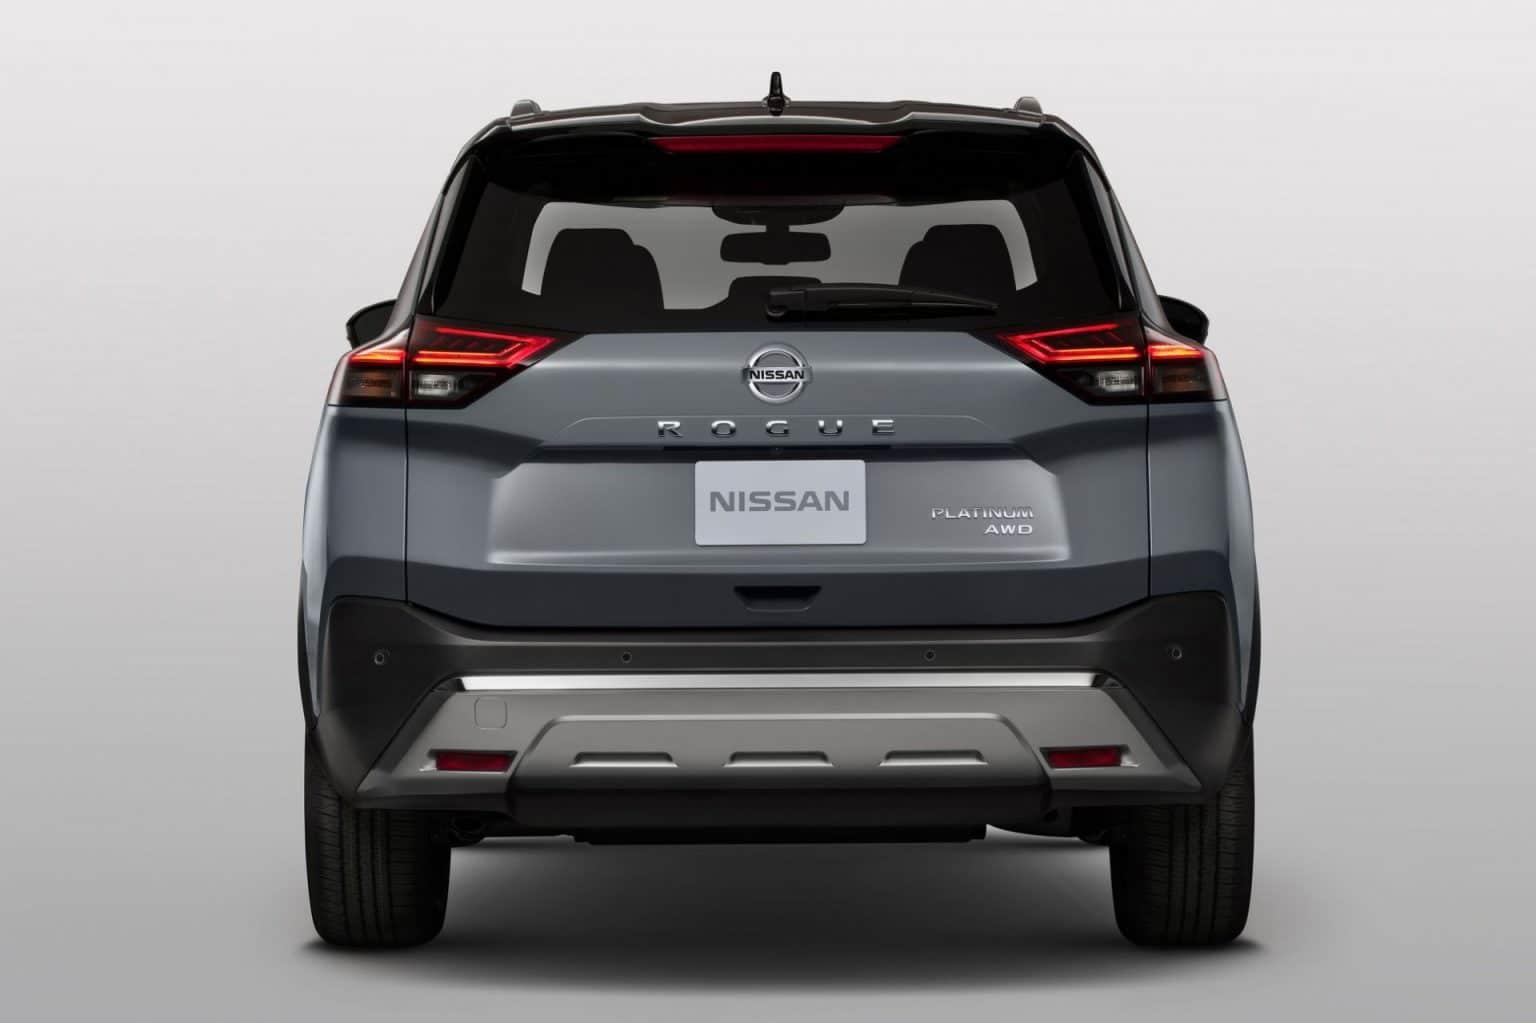 duoi-xe-nissan-x-trail-2021-muaxe-net-1536x1023